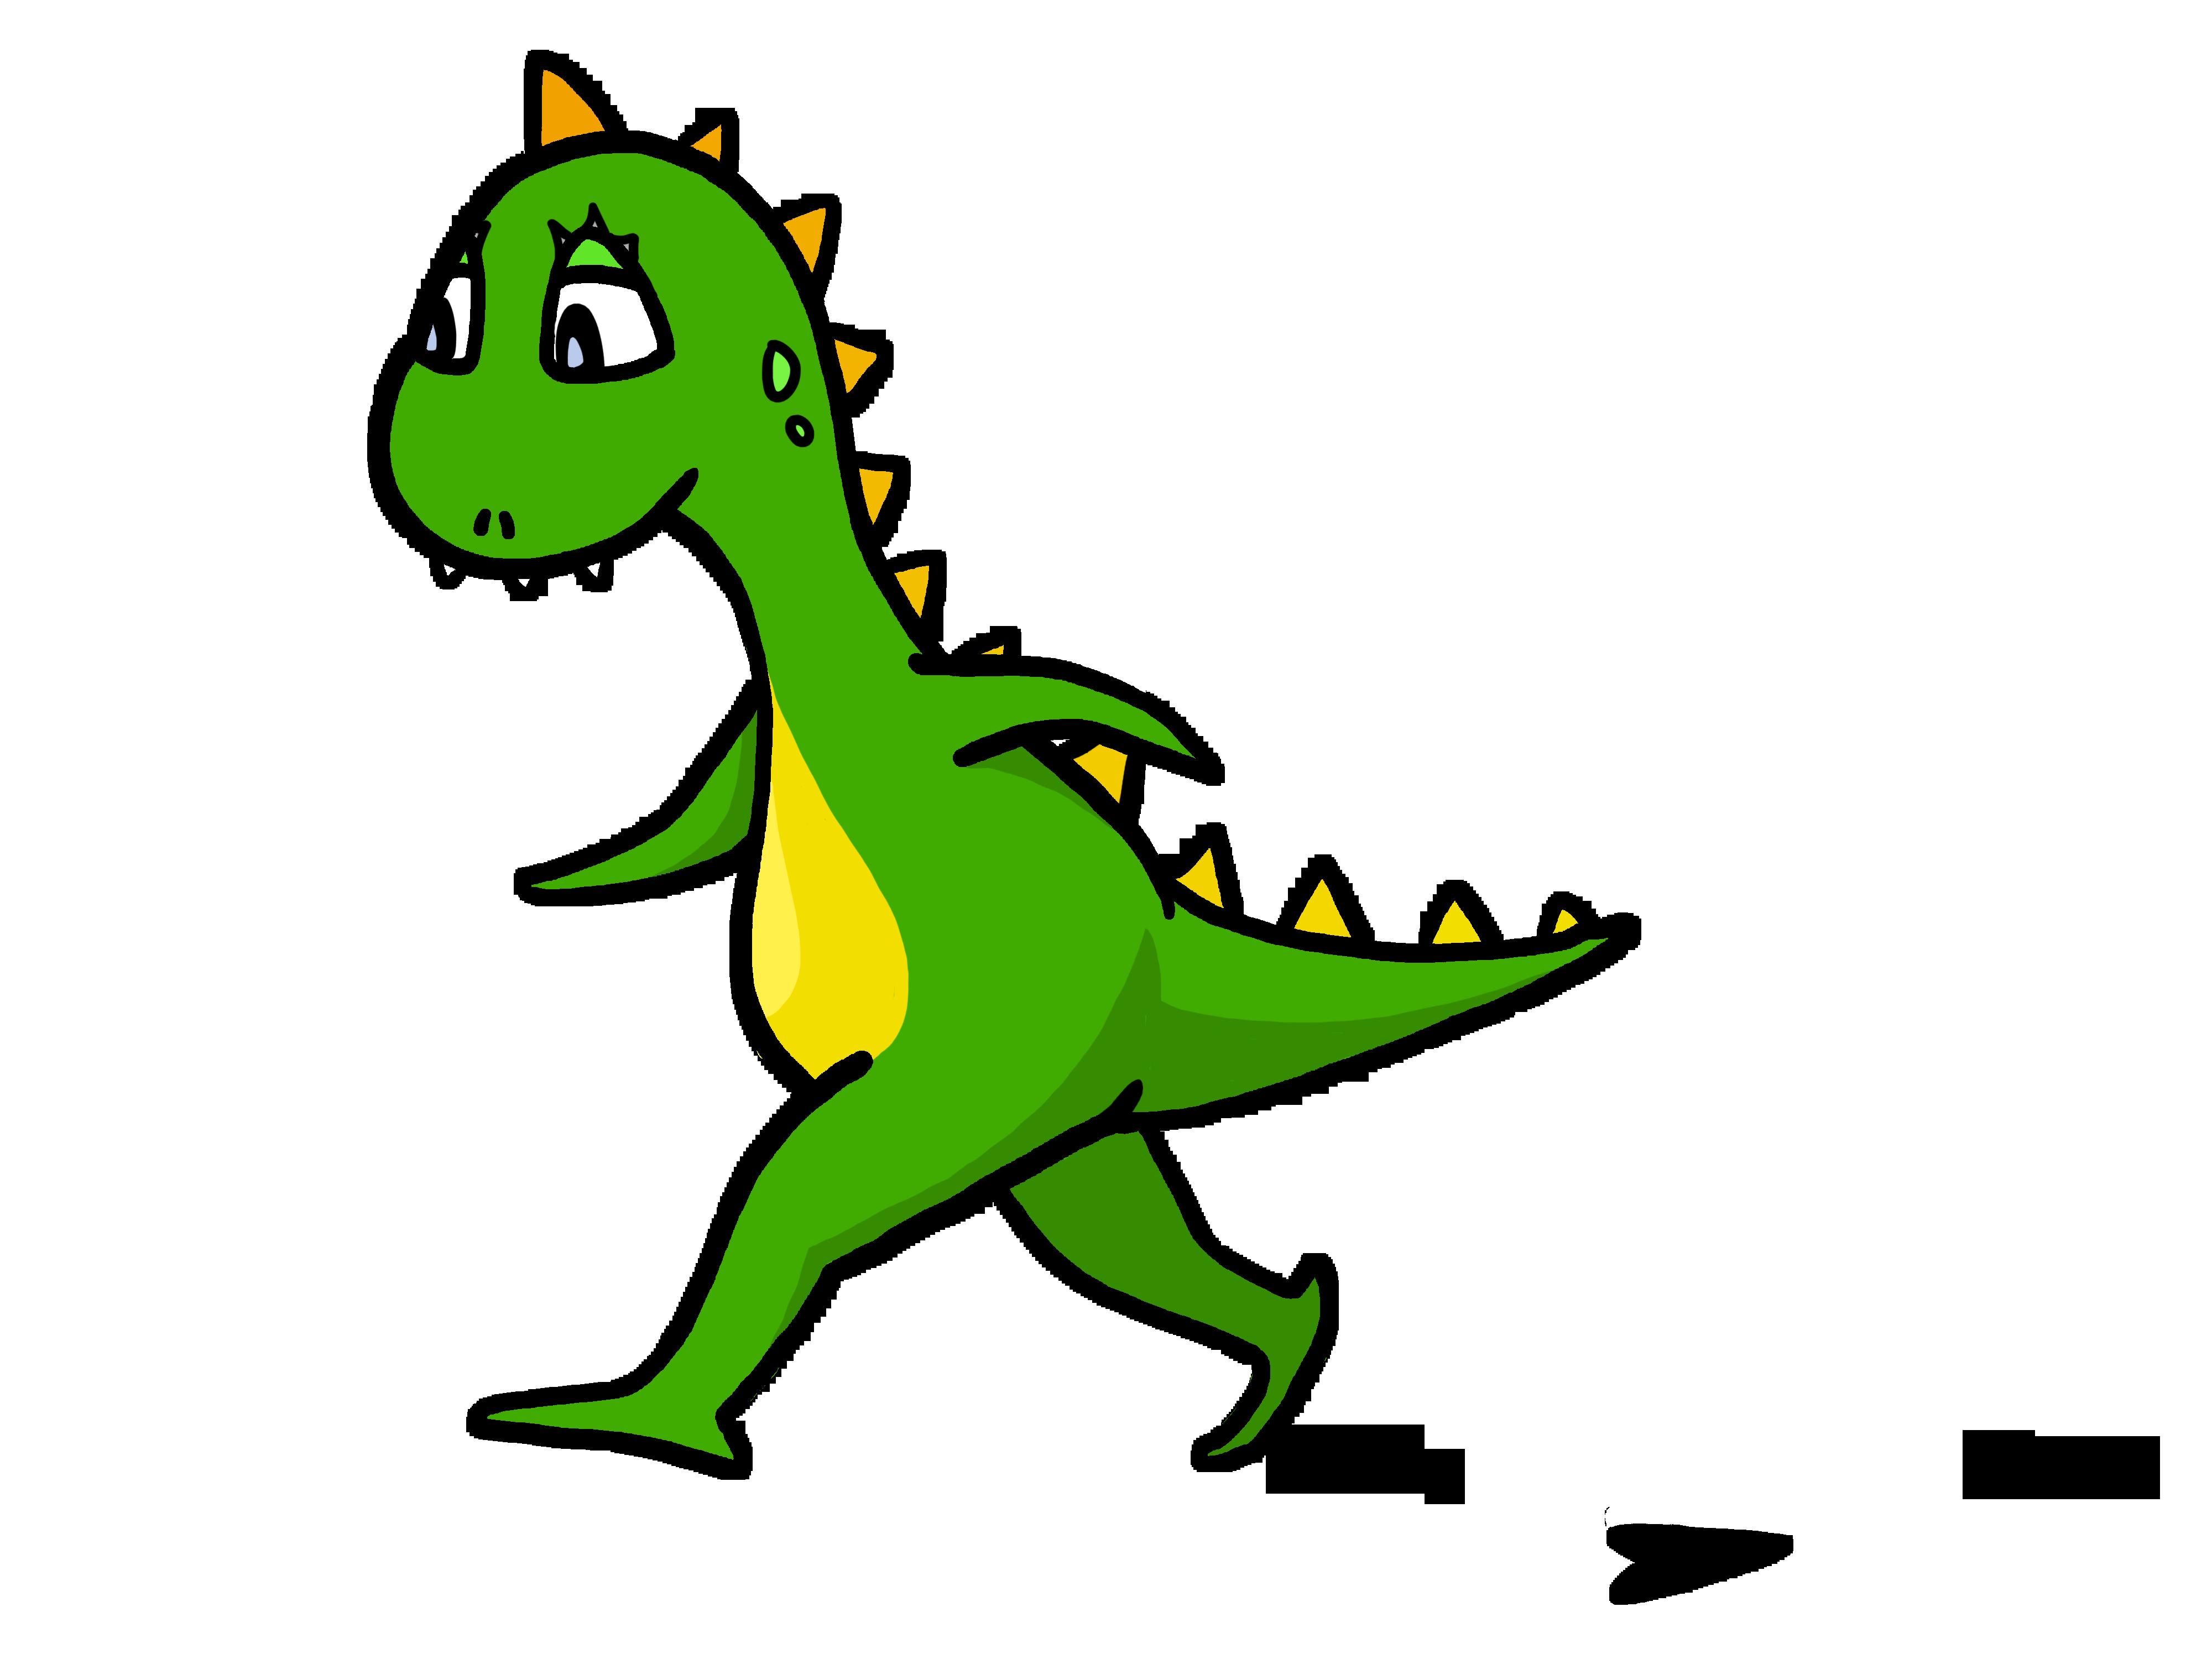 Funny dinosaur free image. Clipart walking walk in line